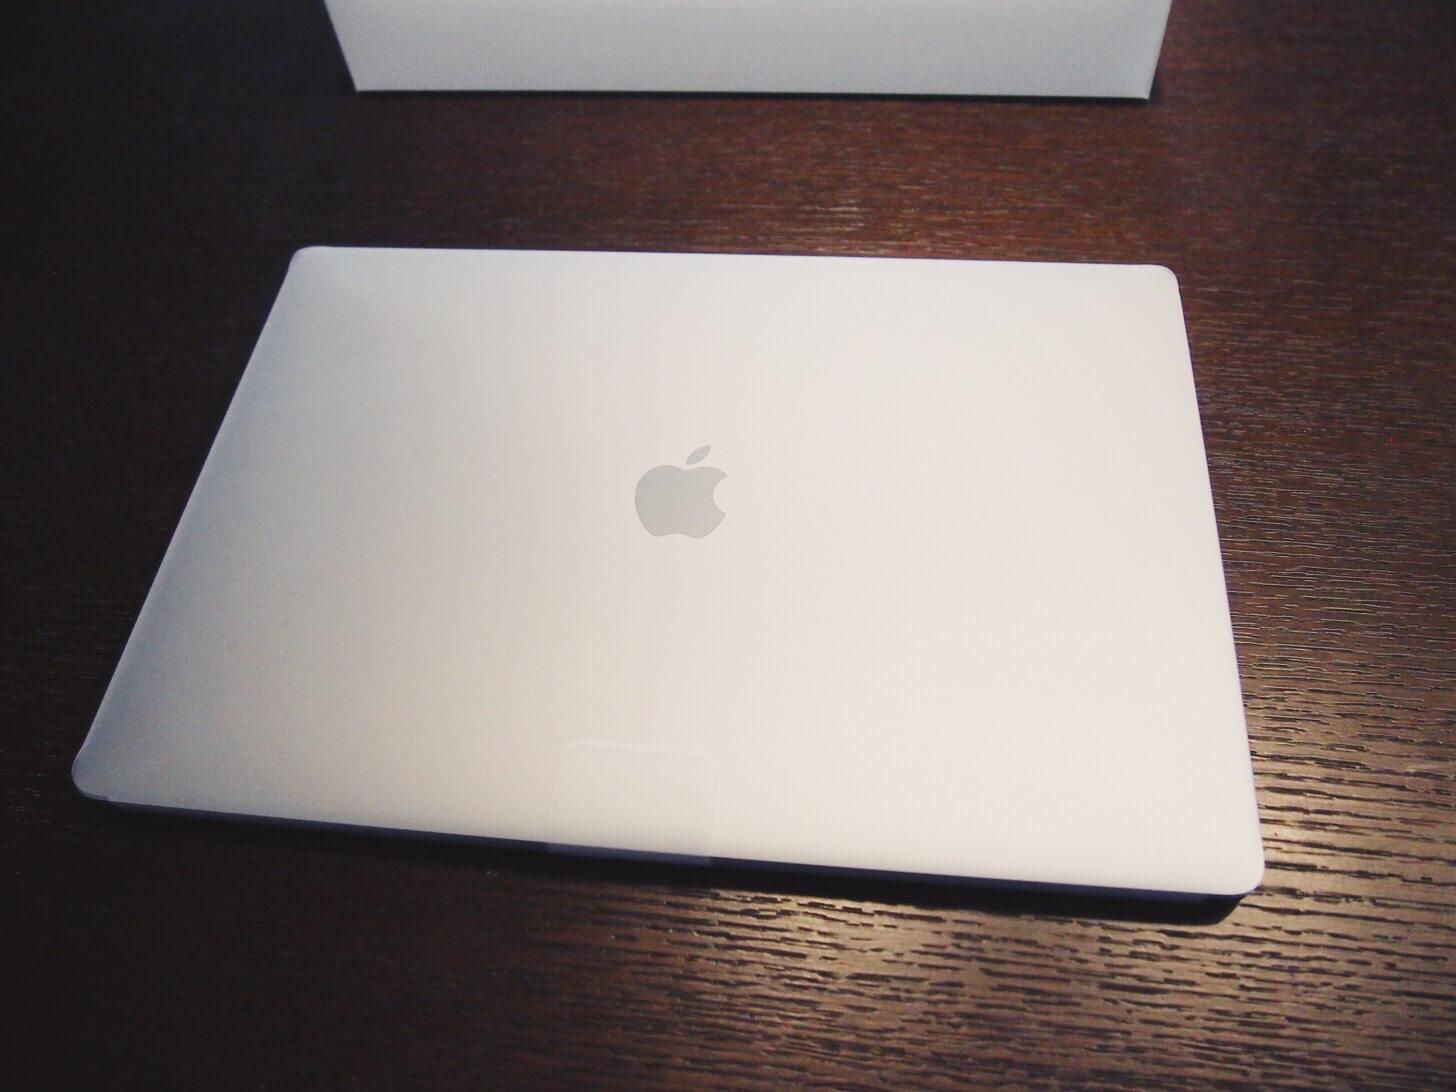 macbookpro2016-15inch-11